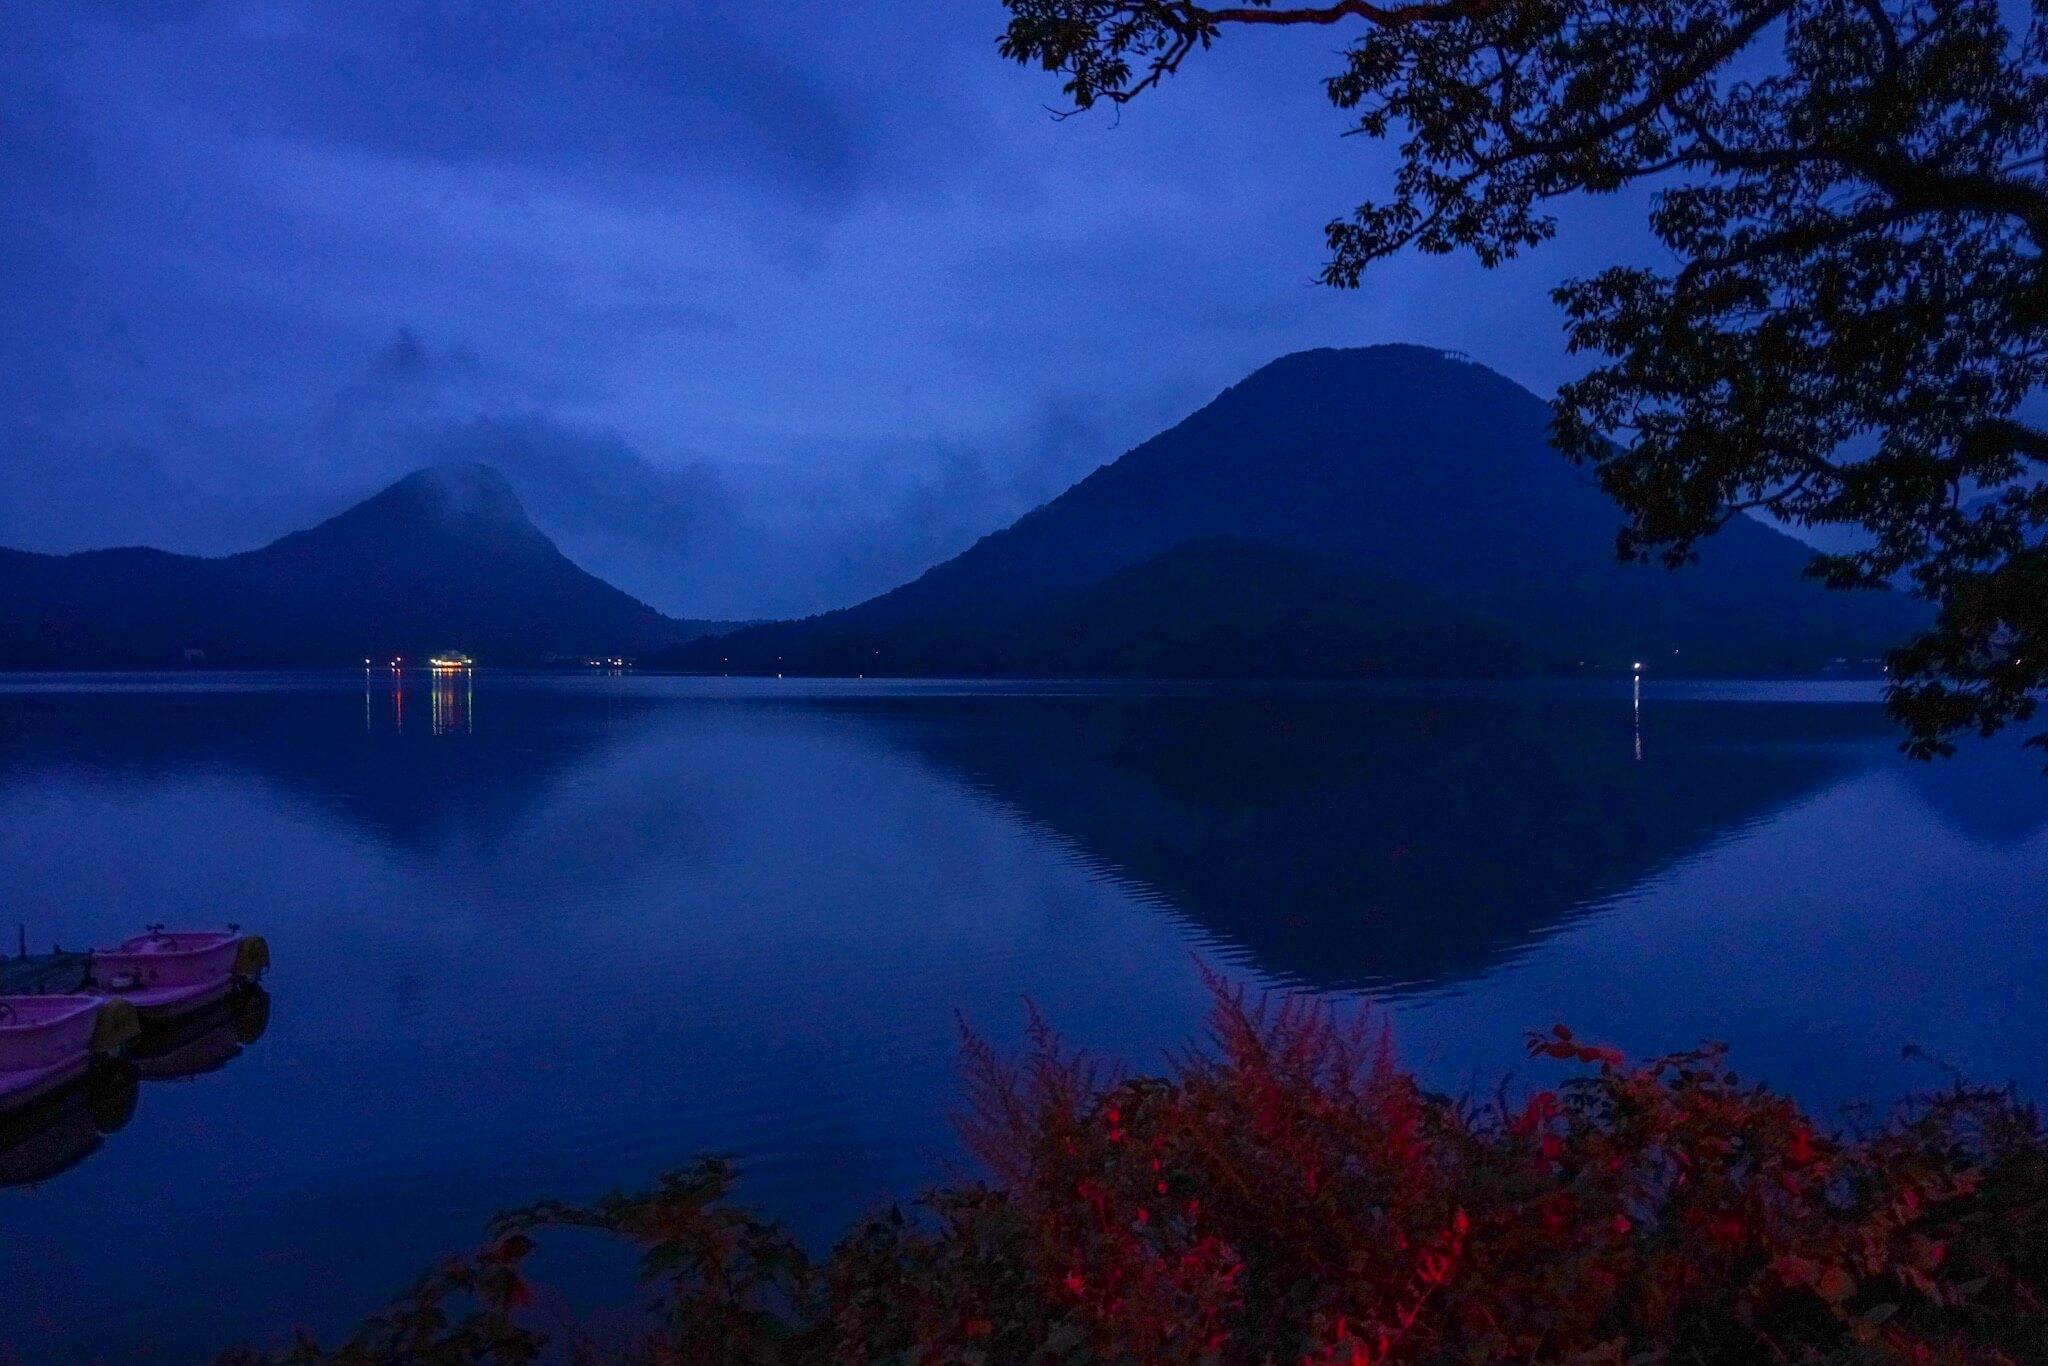 榛名山と榛名湖